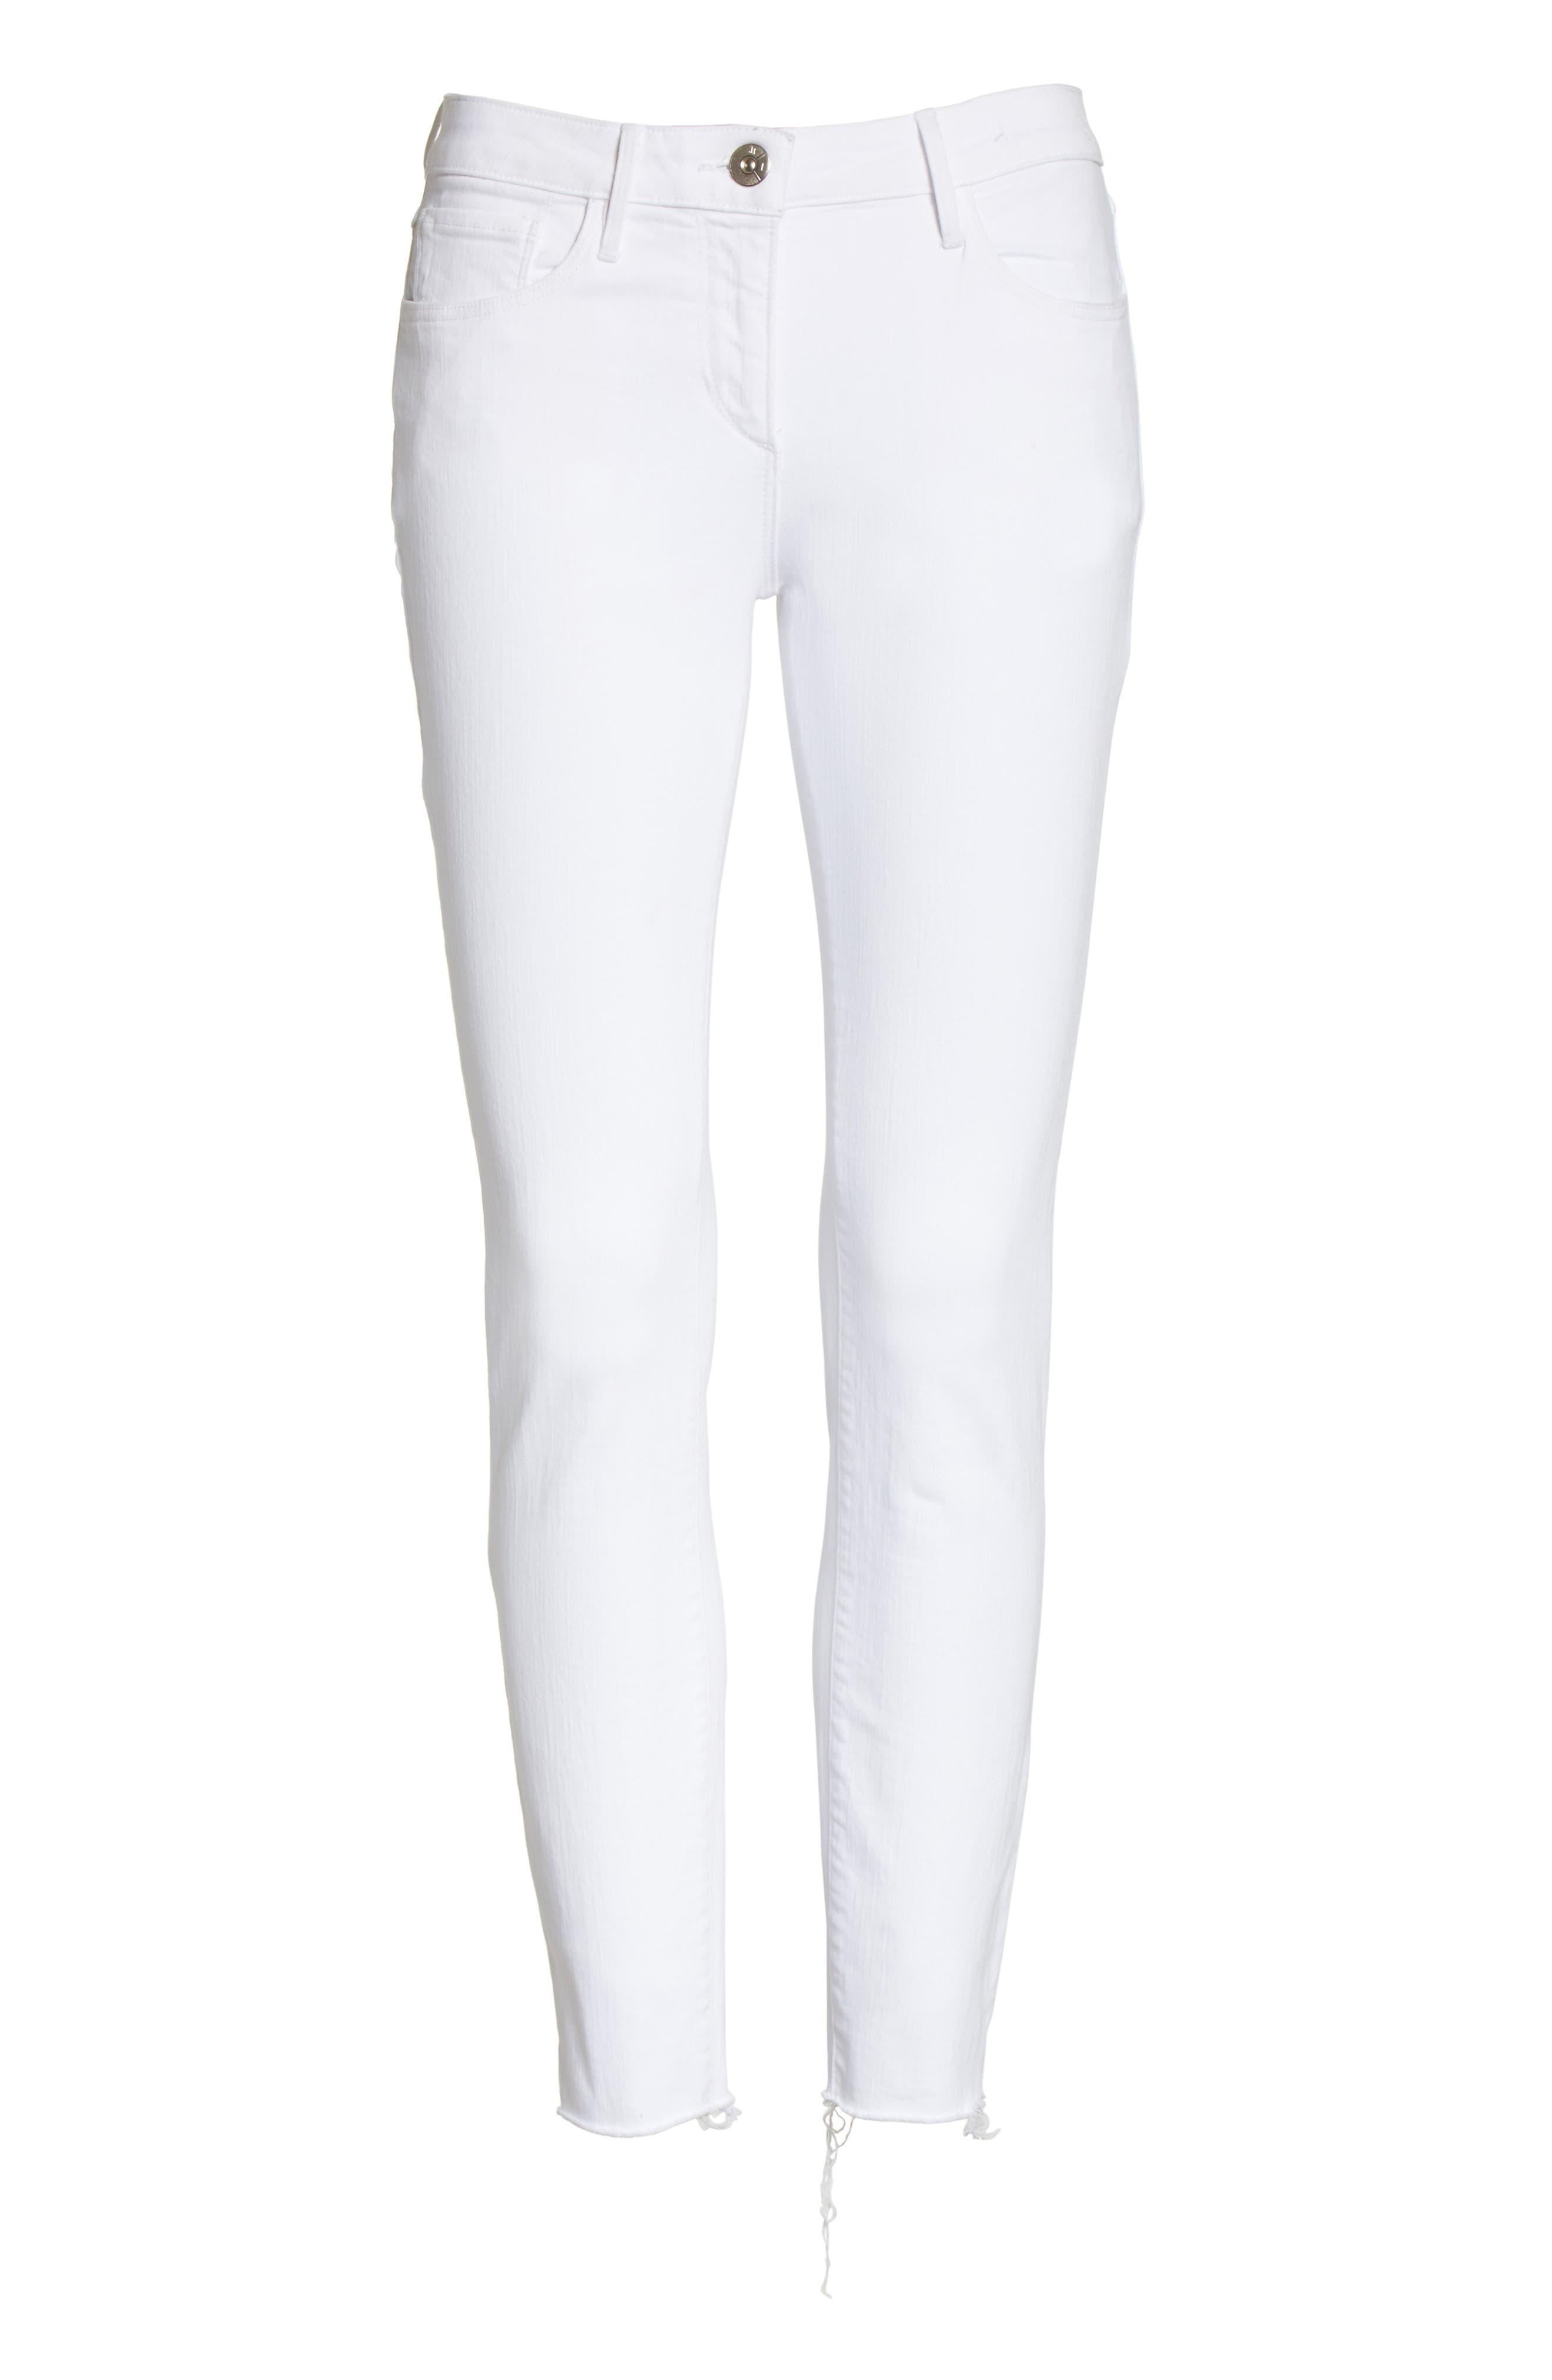 W2 Crop Skinny Jeans,                             Alternate thumbnail 6, color,                             White Tear